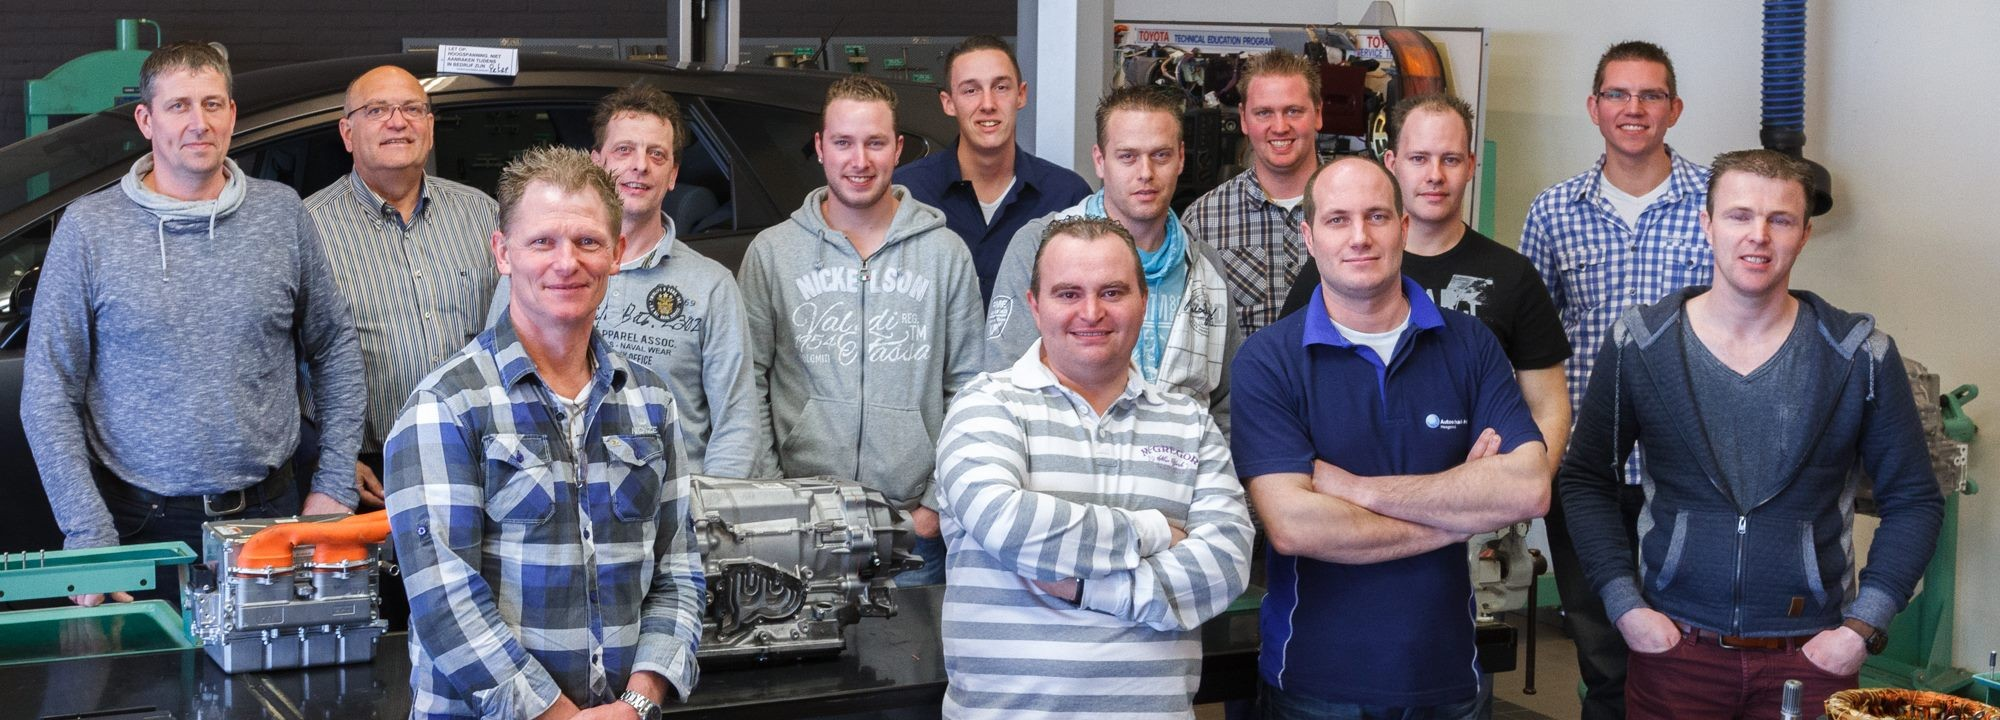 chade Herstel Groep Certificering